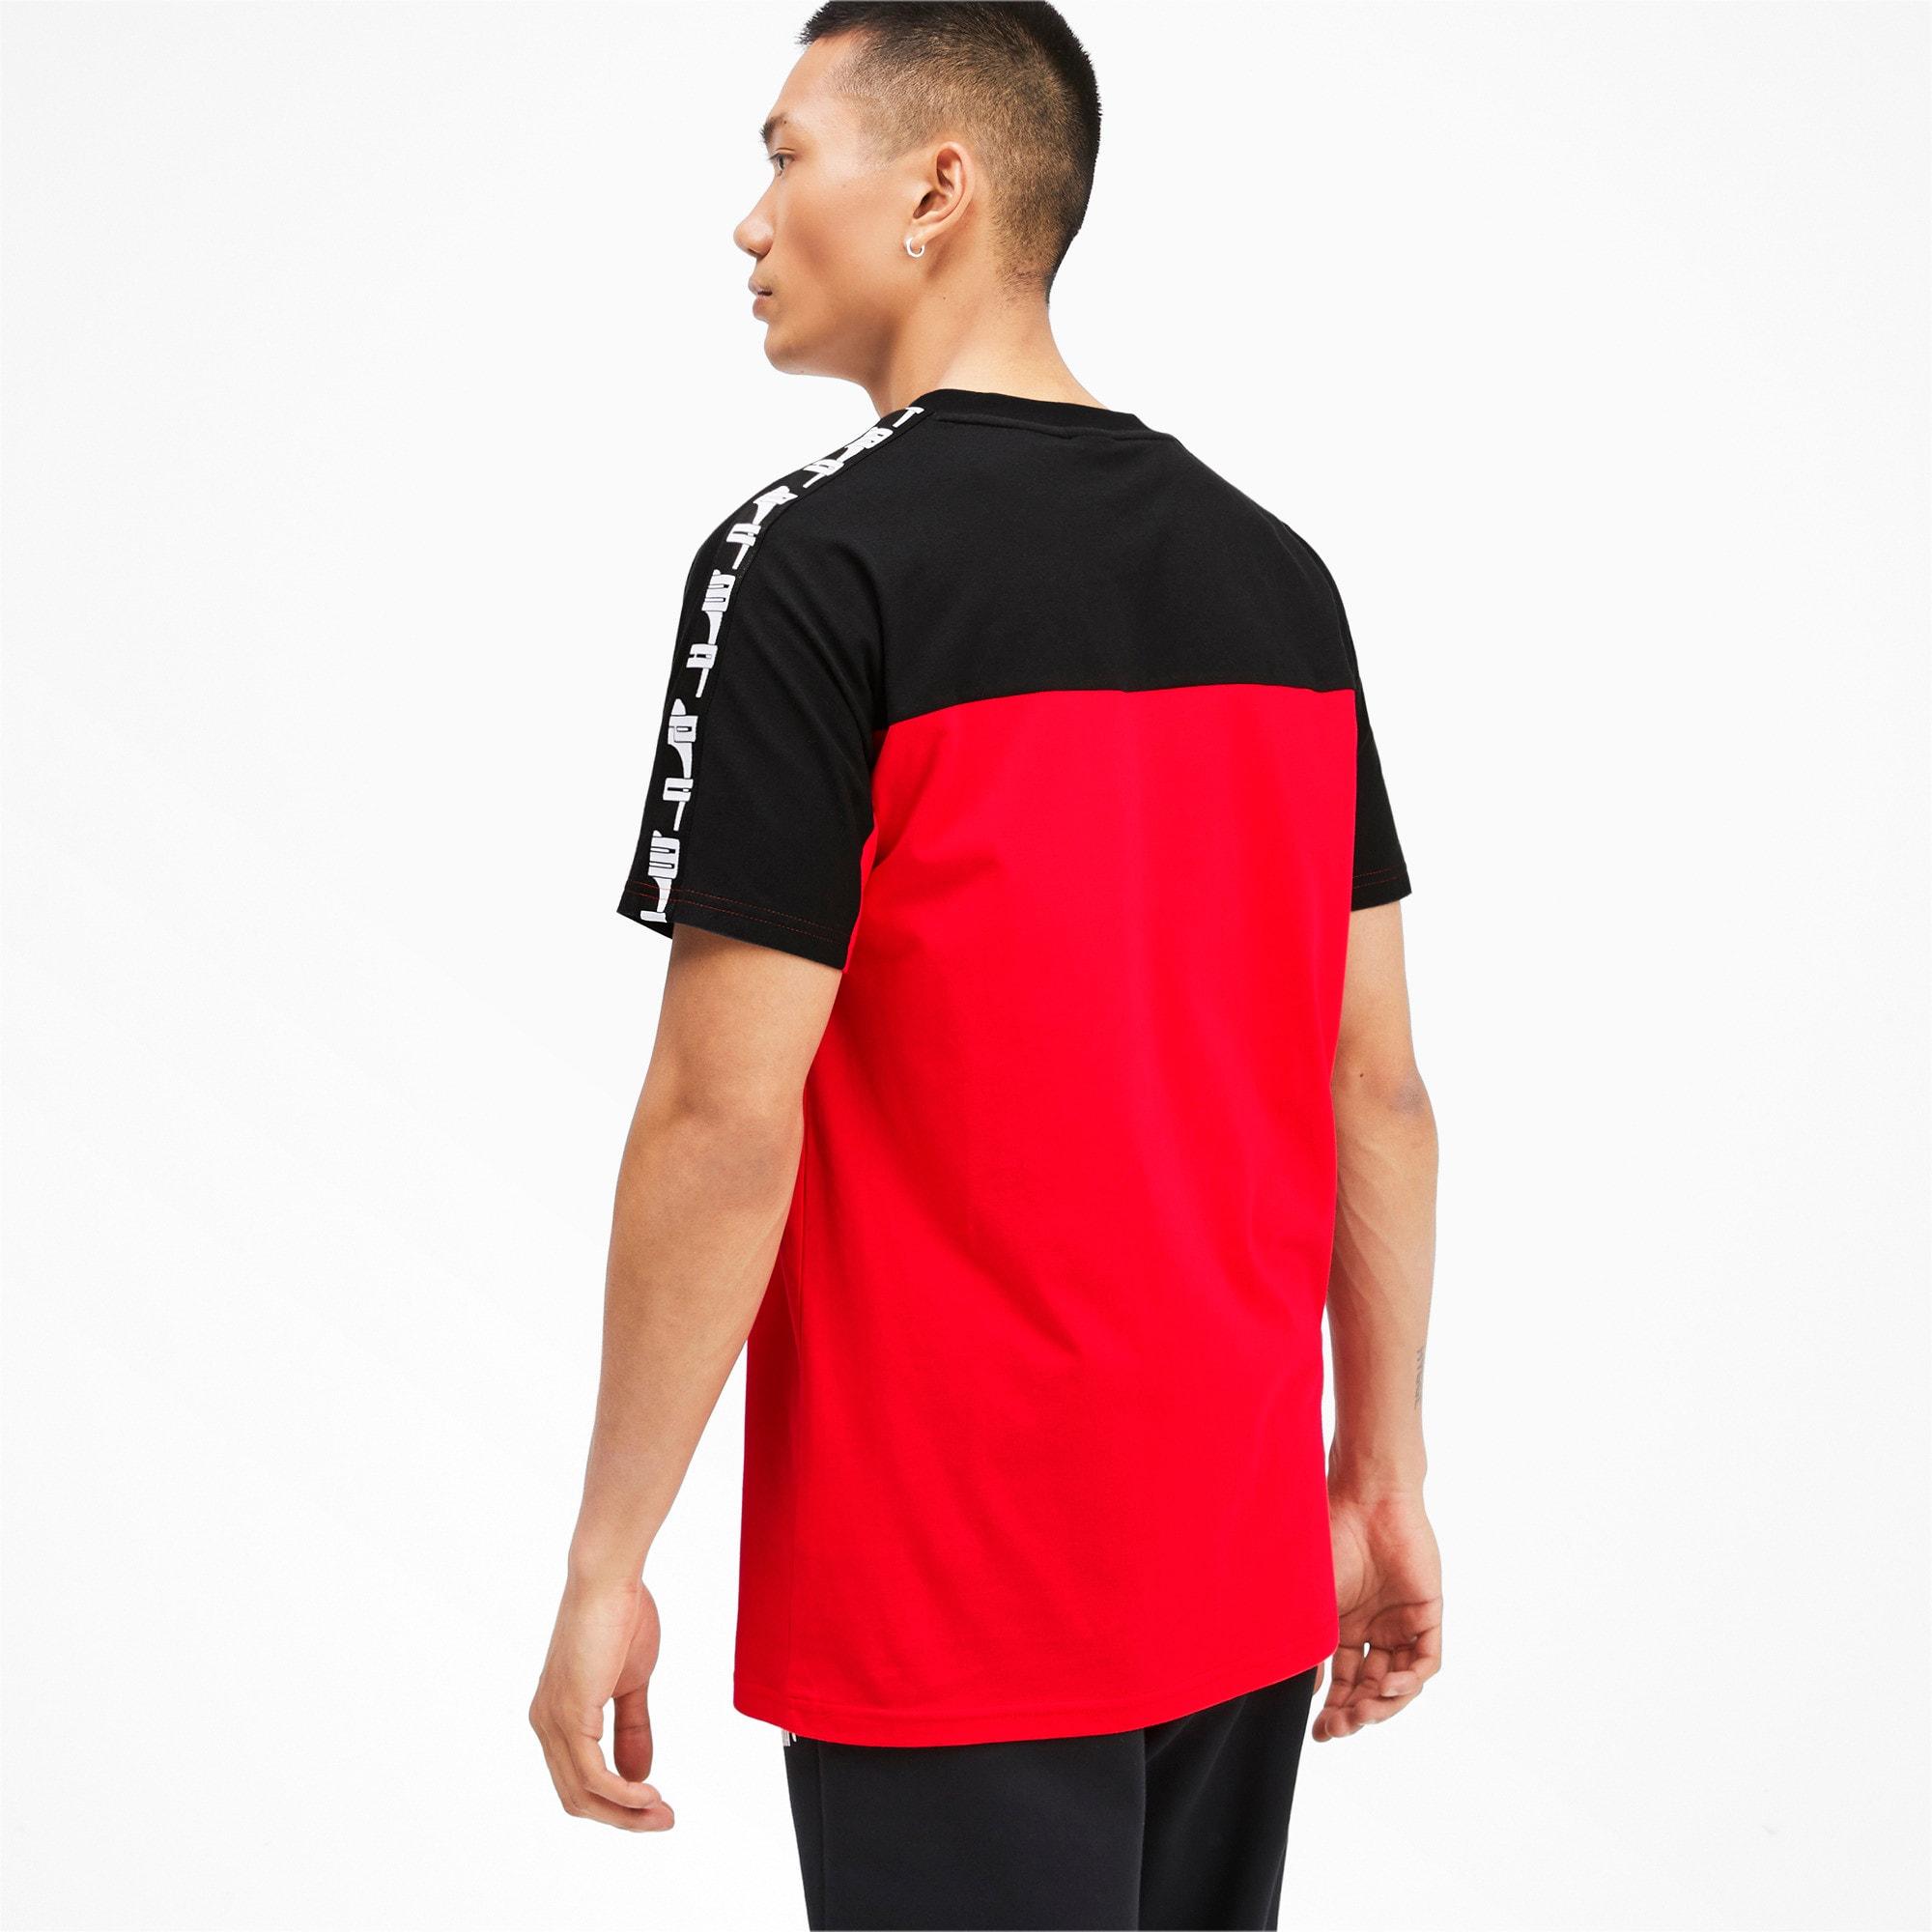 Thumbnail 3 of PUMA XTG SS Tシャツ, High Risk Red, medium-JPN